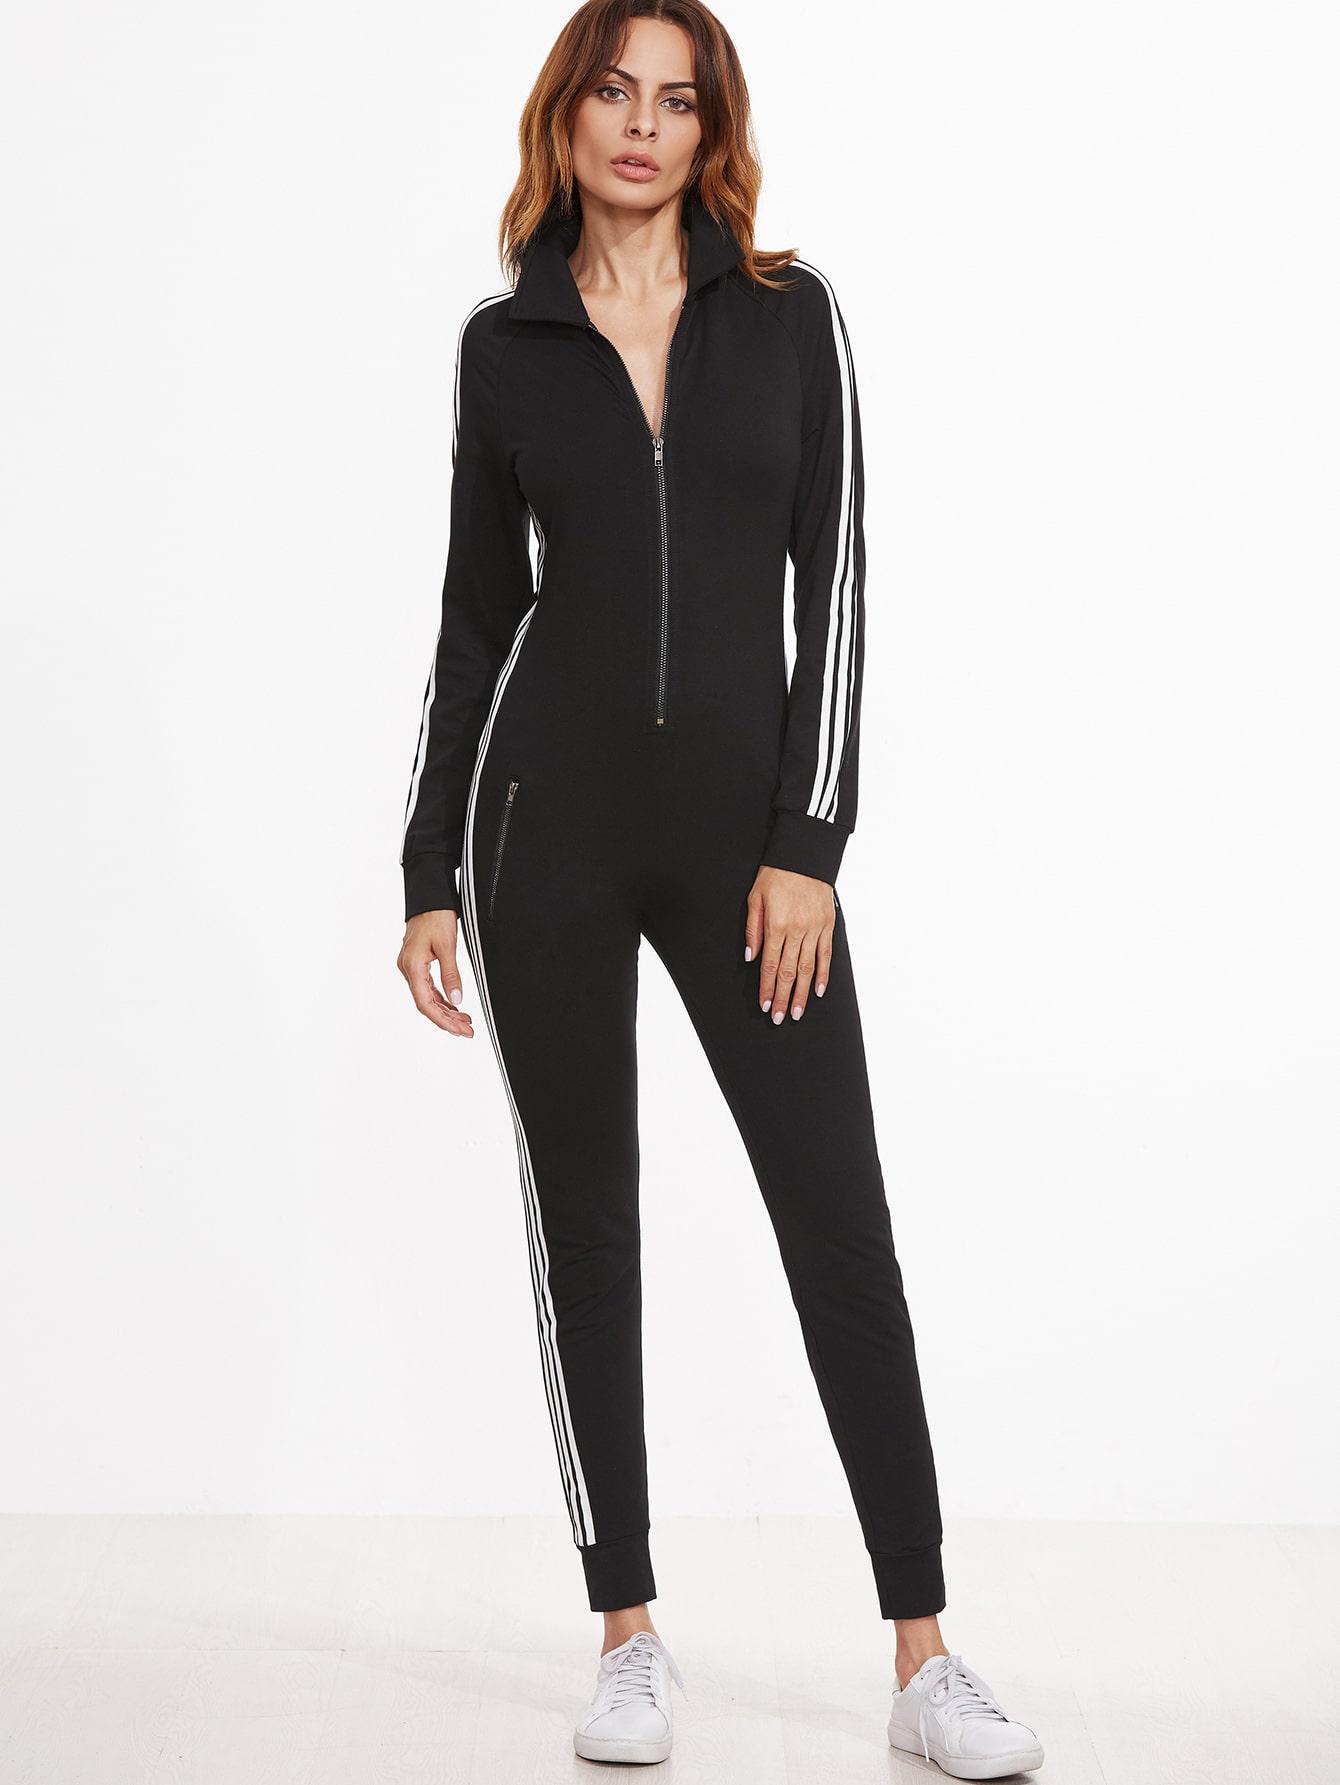 Black Striped Sideseam Zip Up Skinny Sweat JumpsuitBlack Striped Sideseam Zip Up Skinny Sweat Jumpsuit<br><br>color: Black<br>size: L,M,S,XS